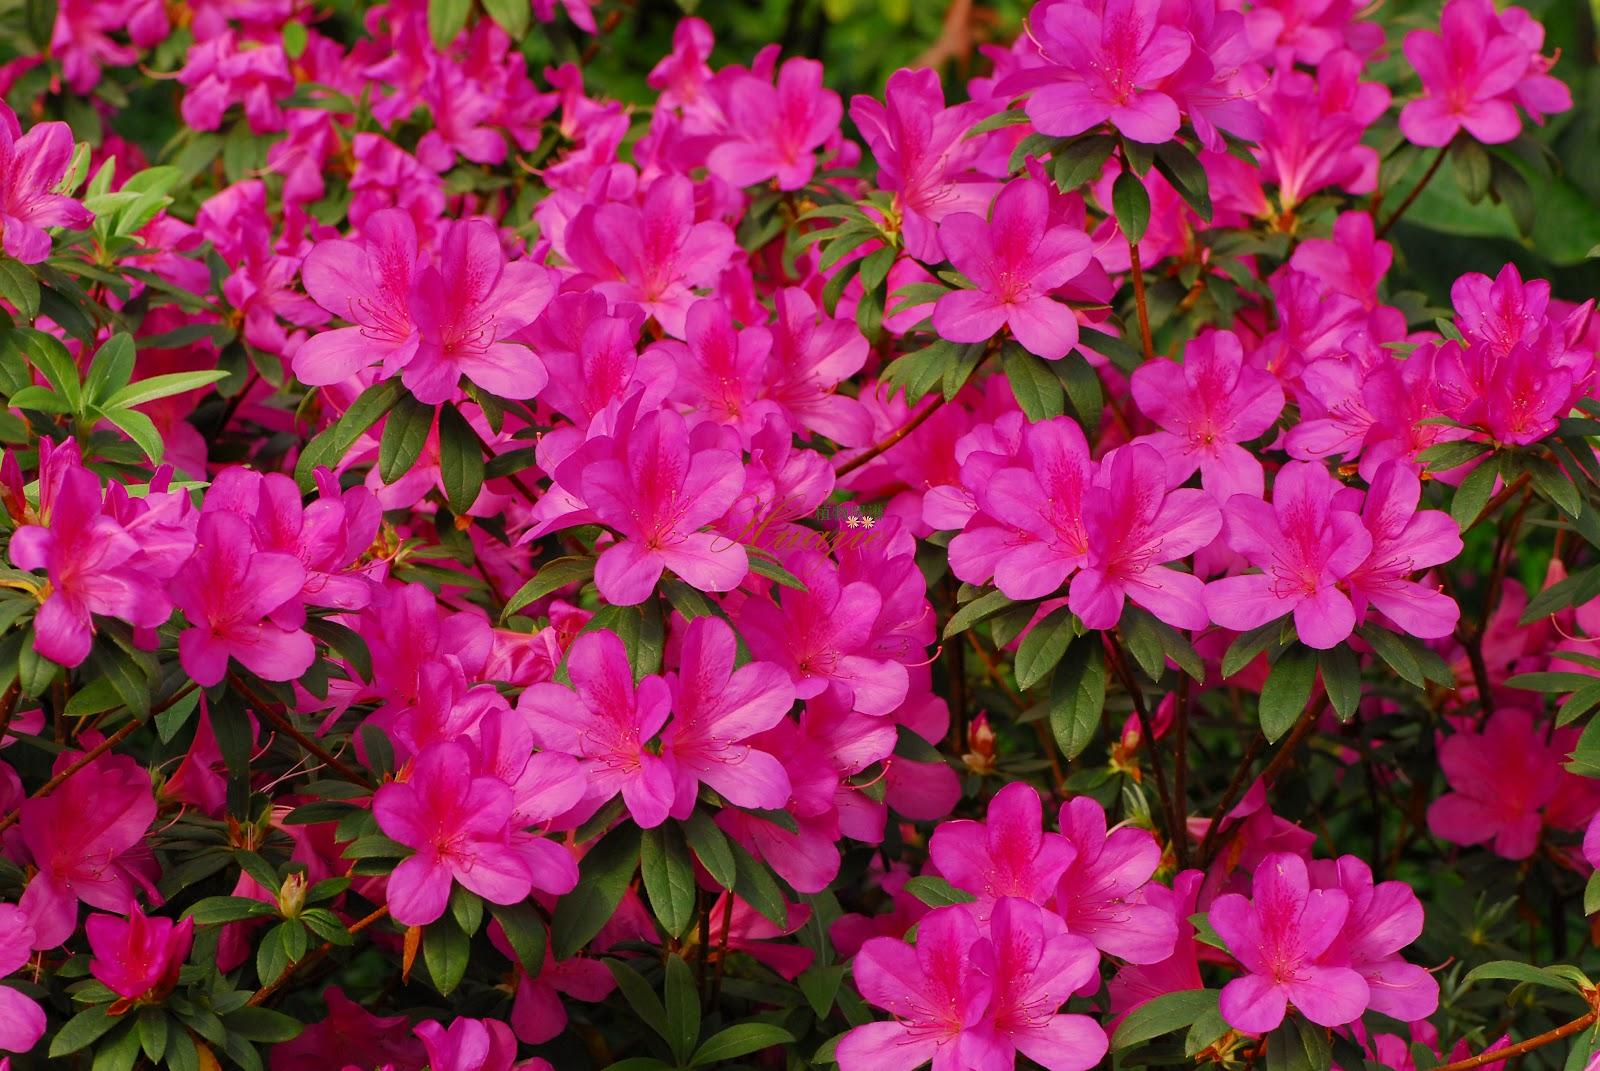 Ch cara flora rohn plantas ornamentais paisagismo for Especies de arbustos